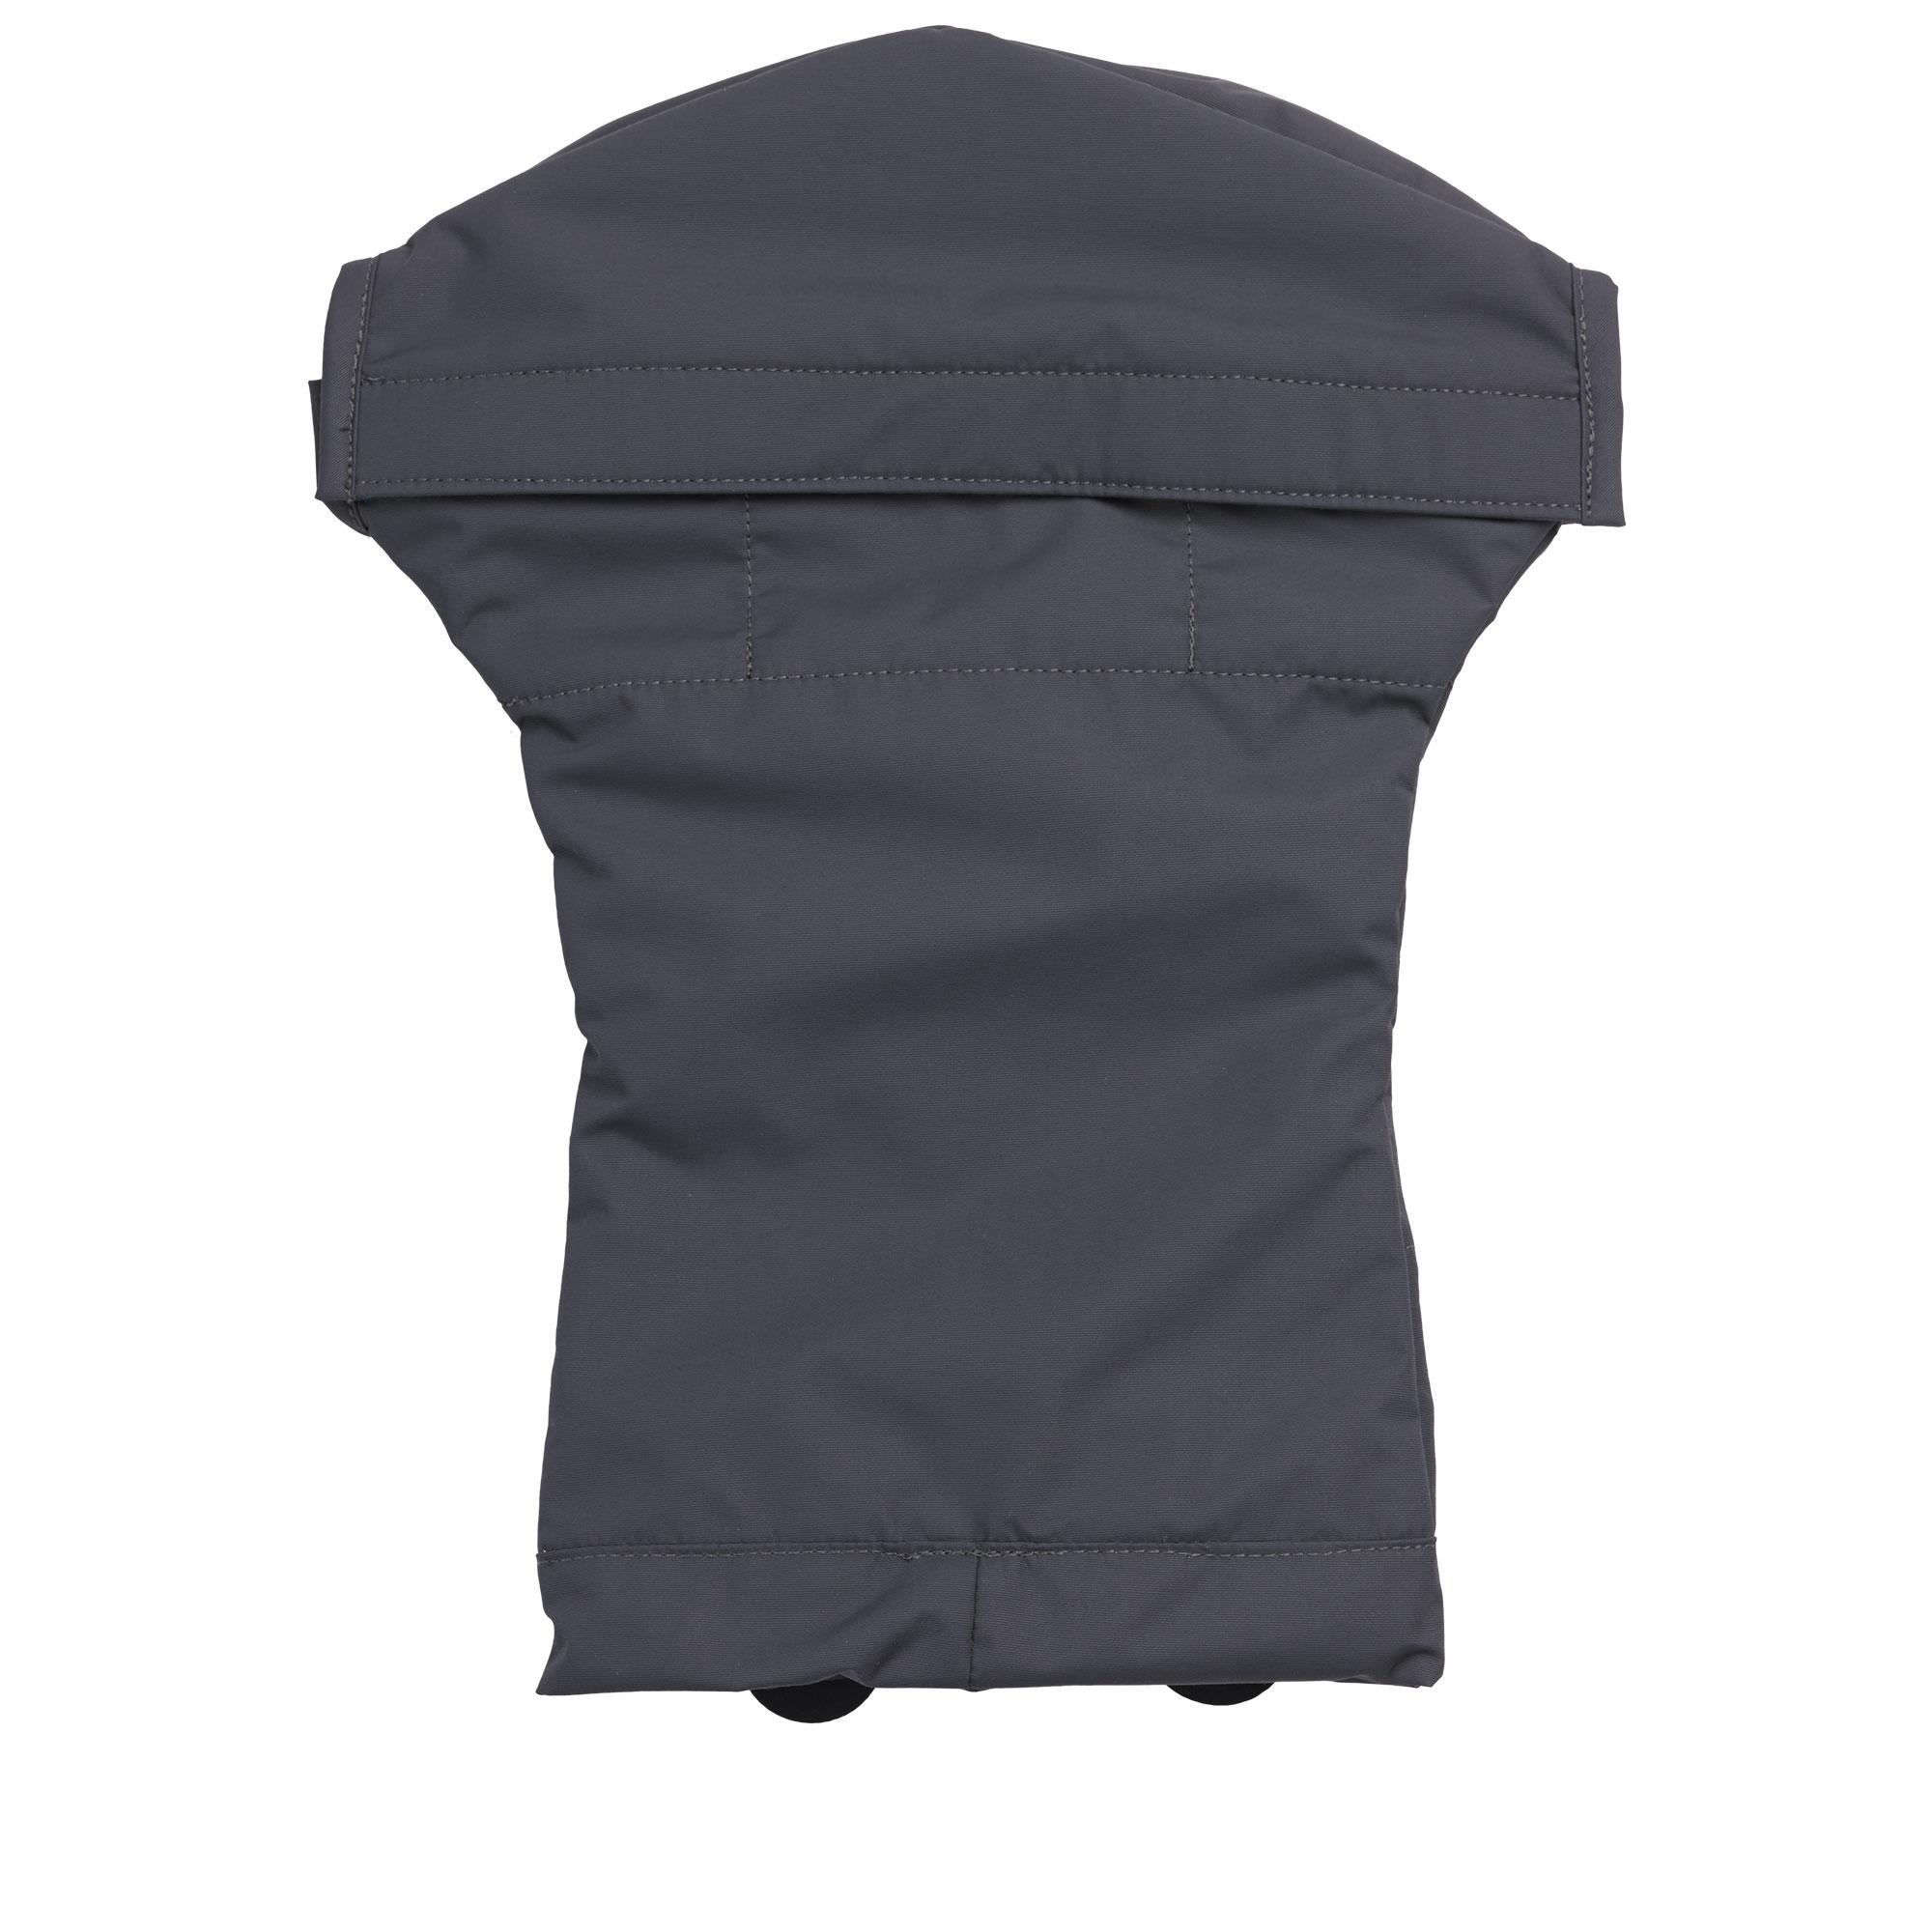 Bekleidung Jet Grey Palm Aktuelle Kajak Handschuhe Bootsport